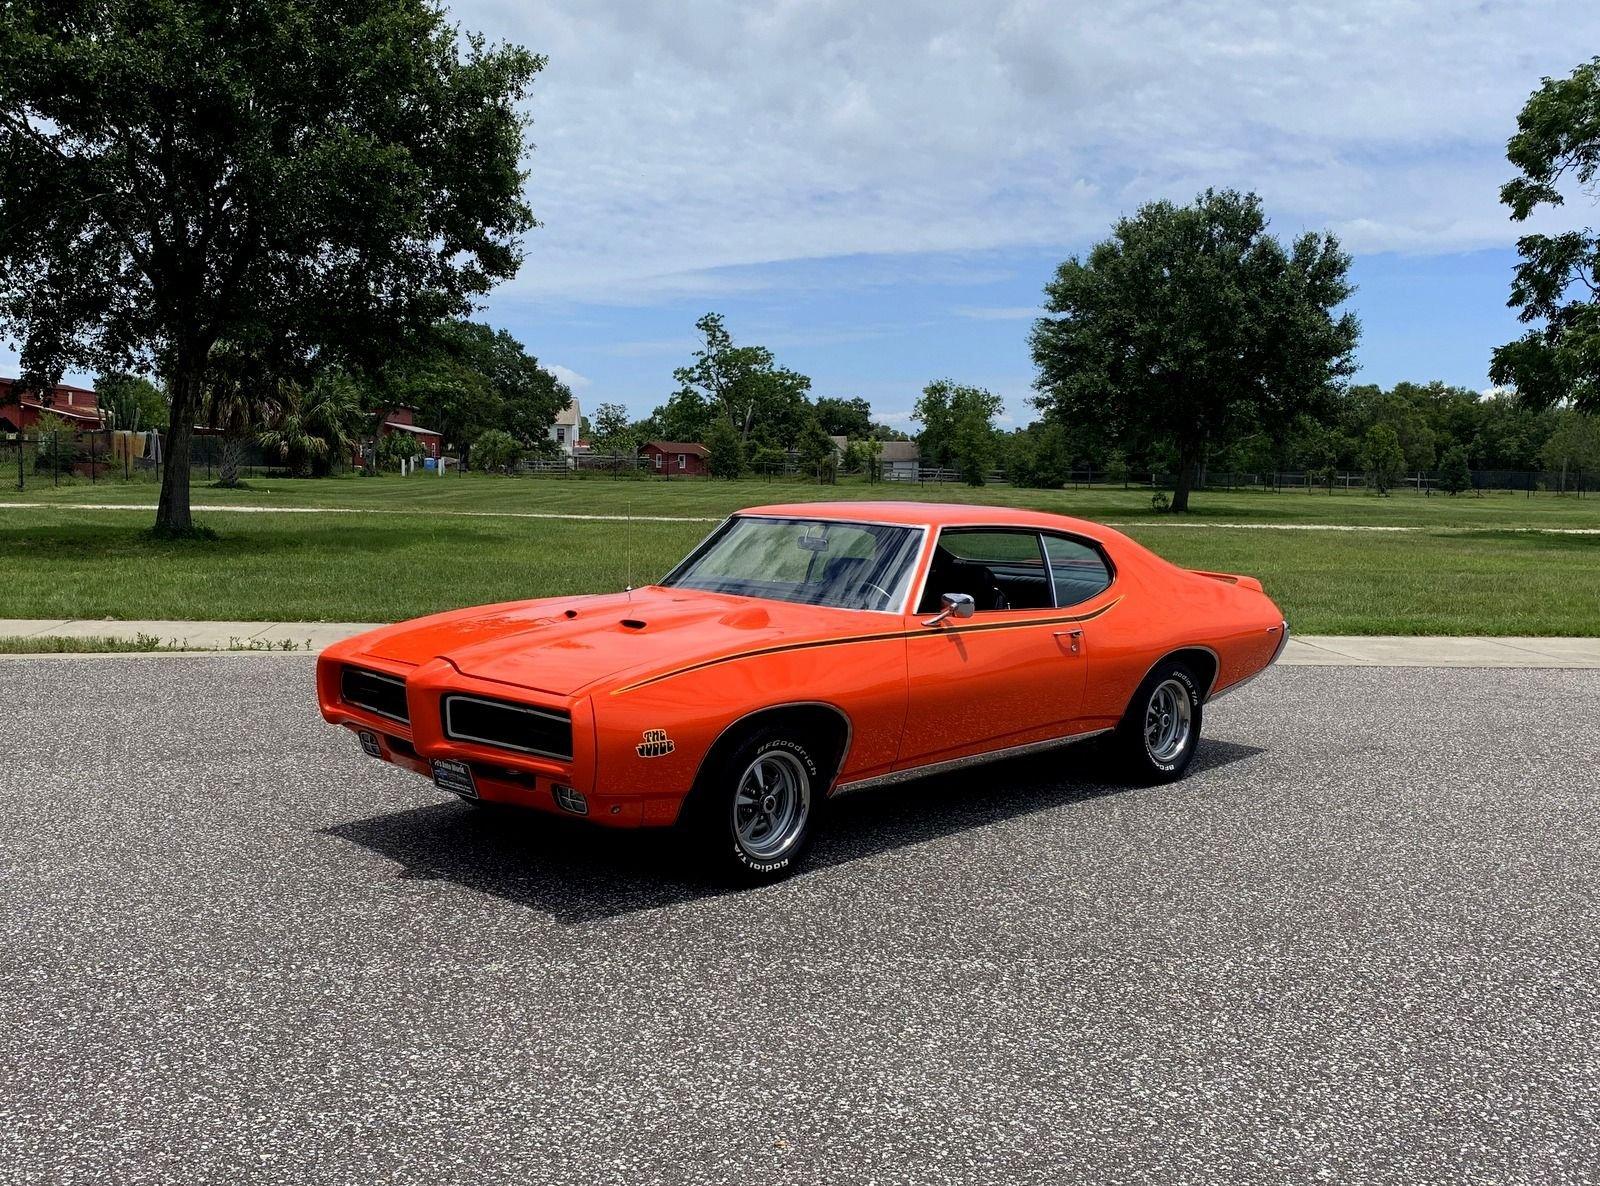 1969 Pontiac Gto Pj S Auto World Classic Cars For Sale